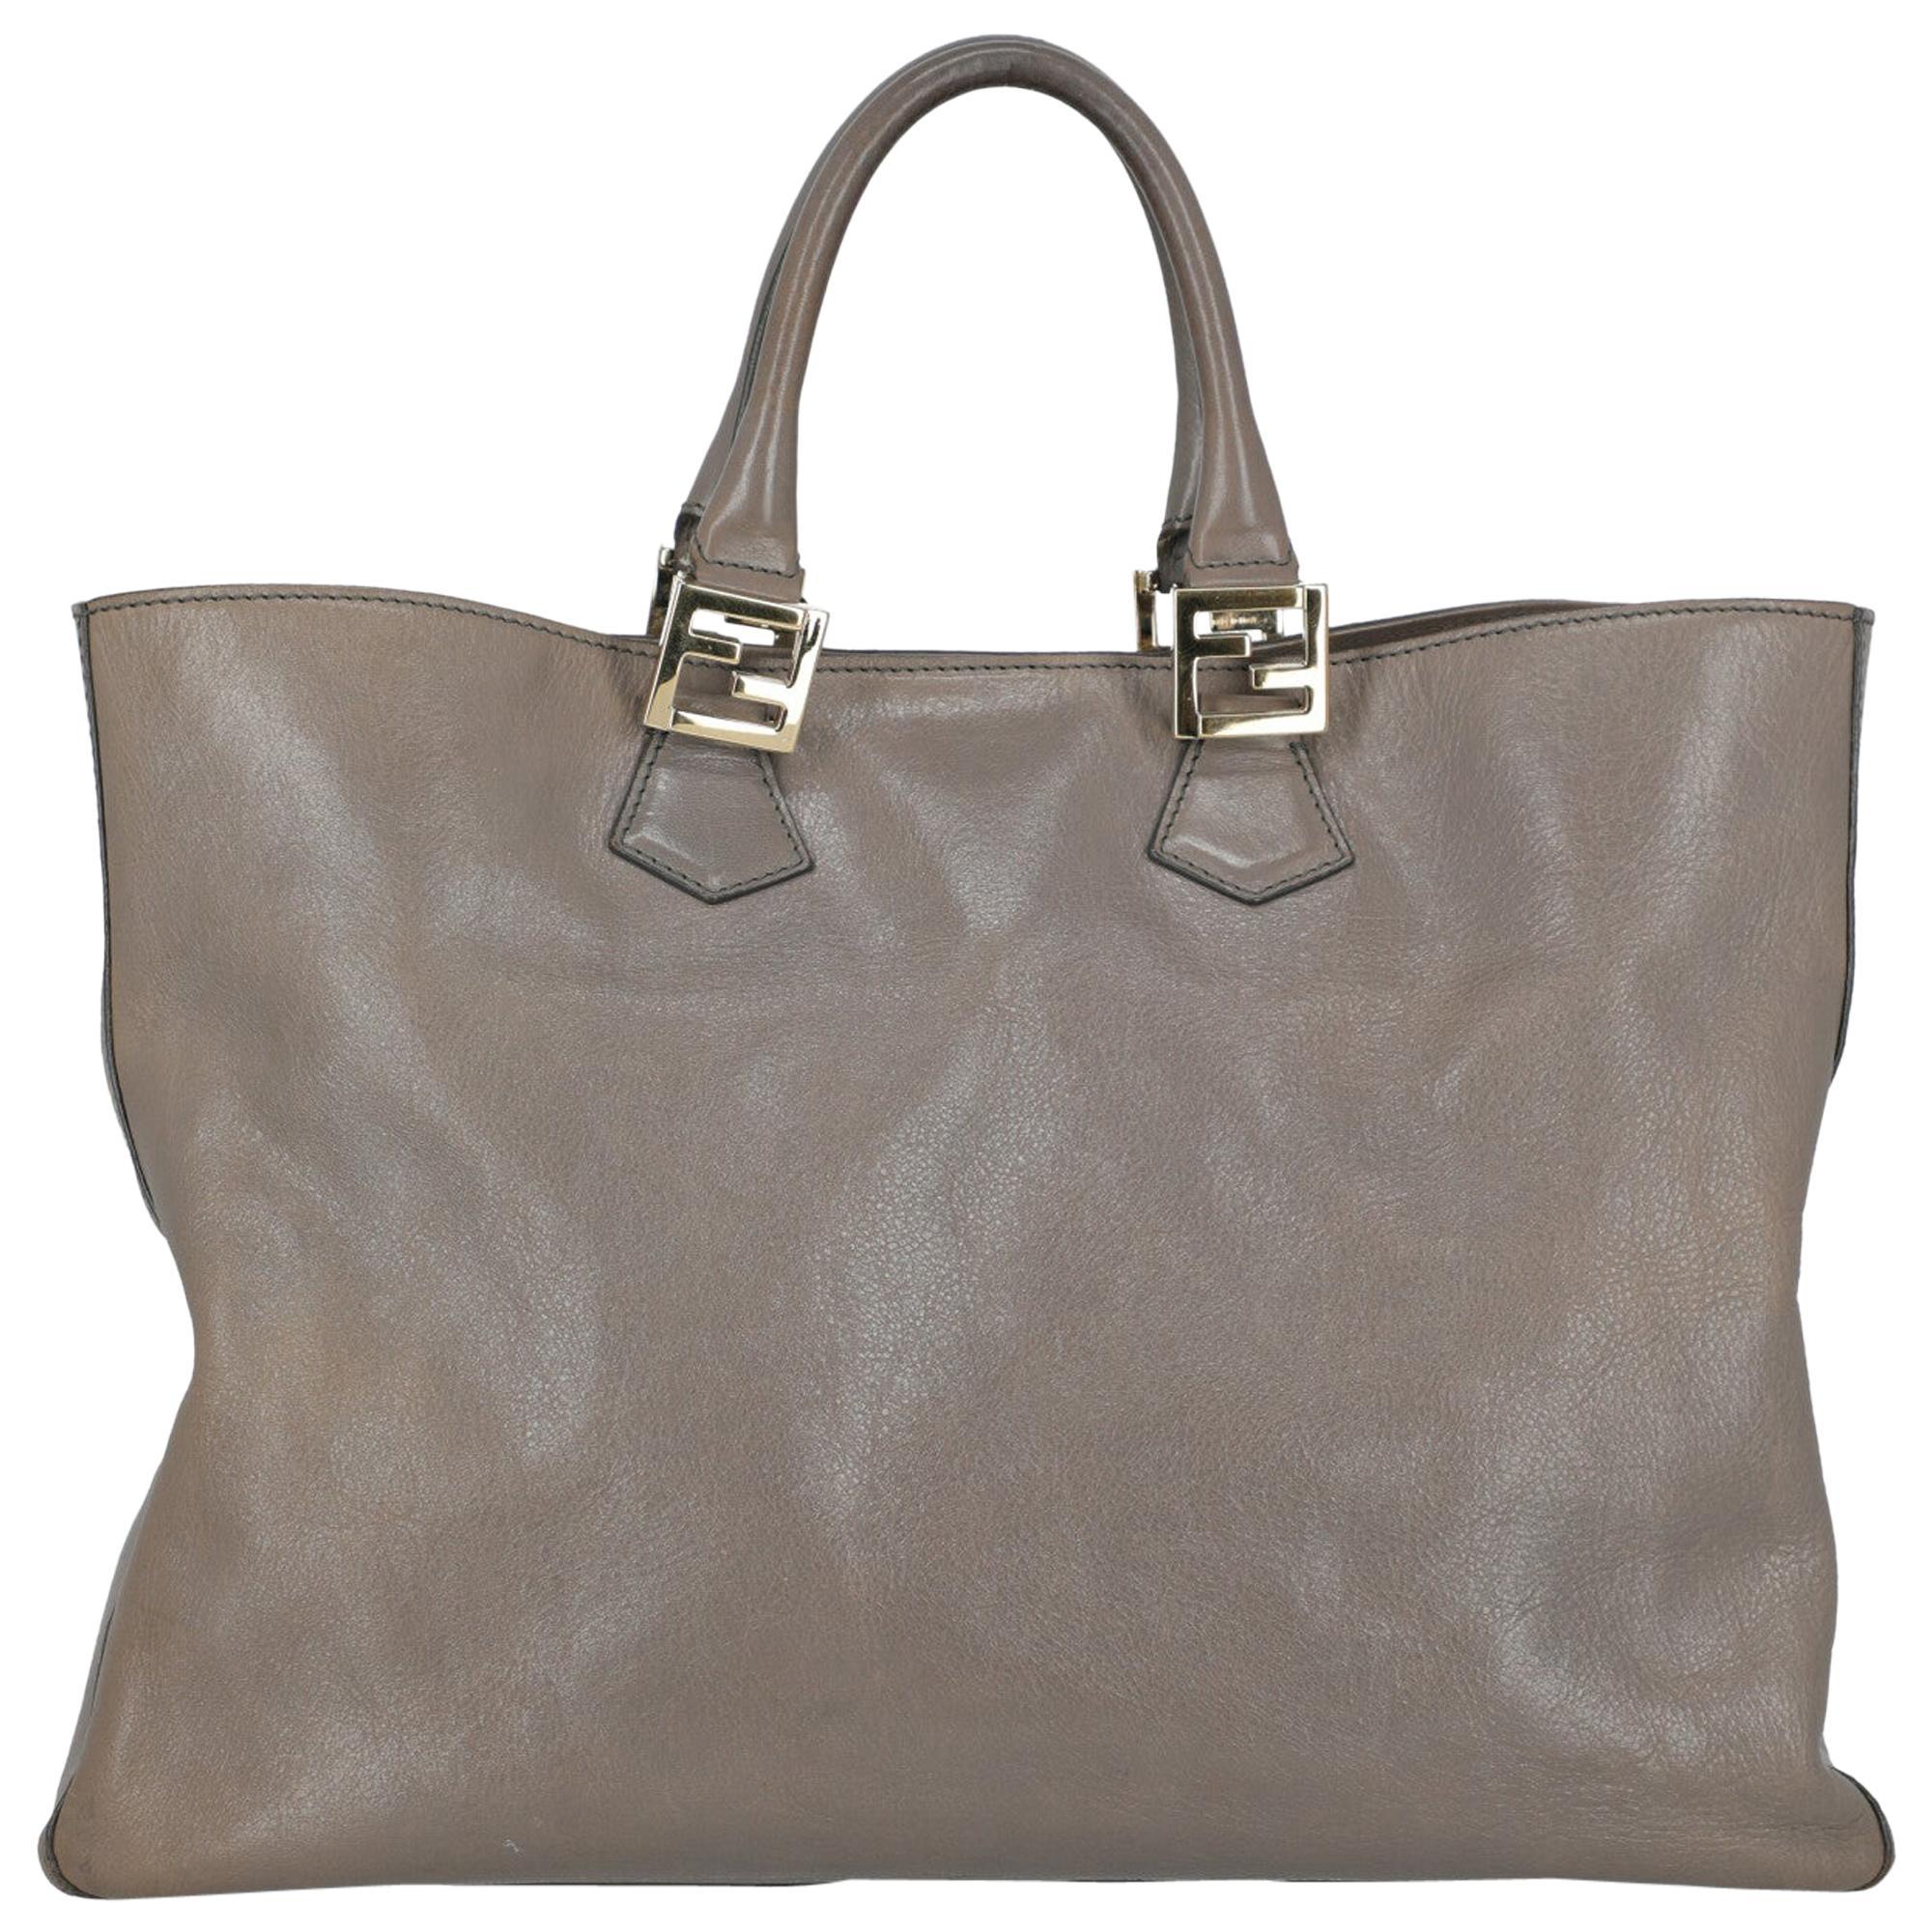 Fendi Women's Tote Bag  Grey Leather